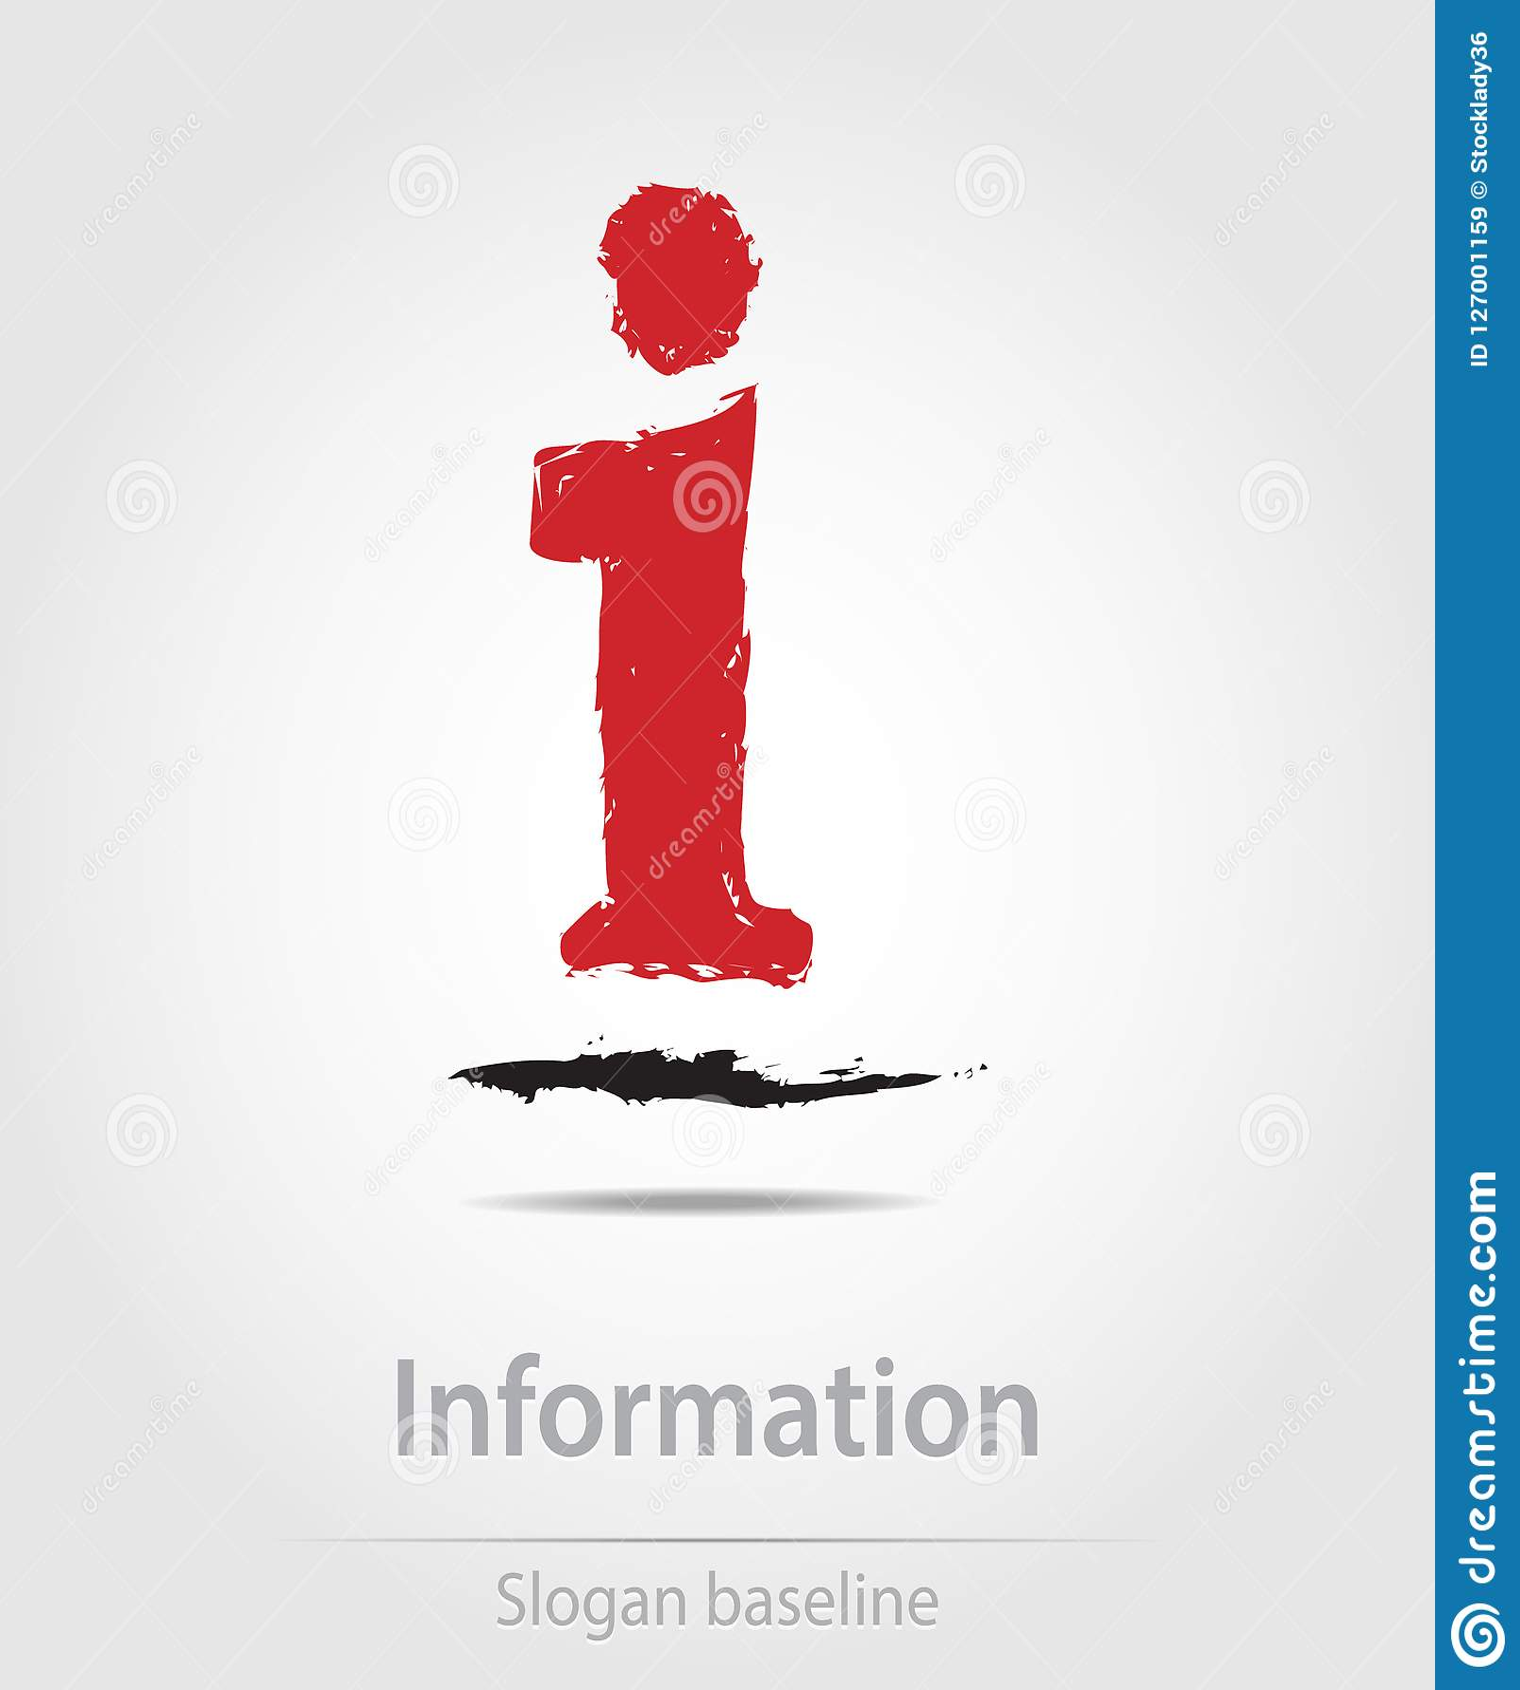 Originally created information vector business icon